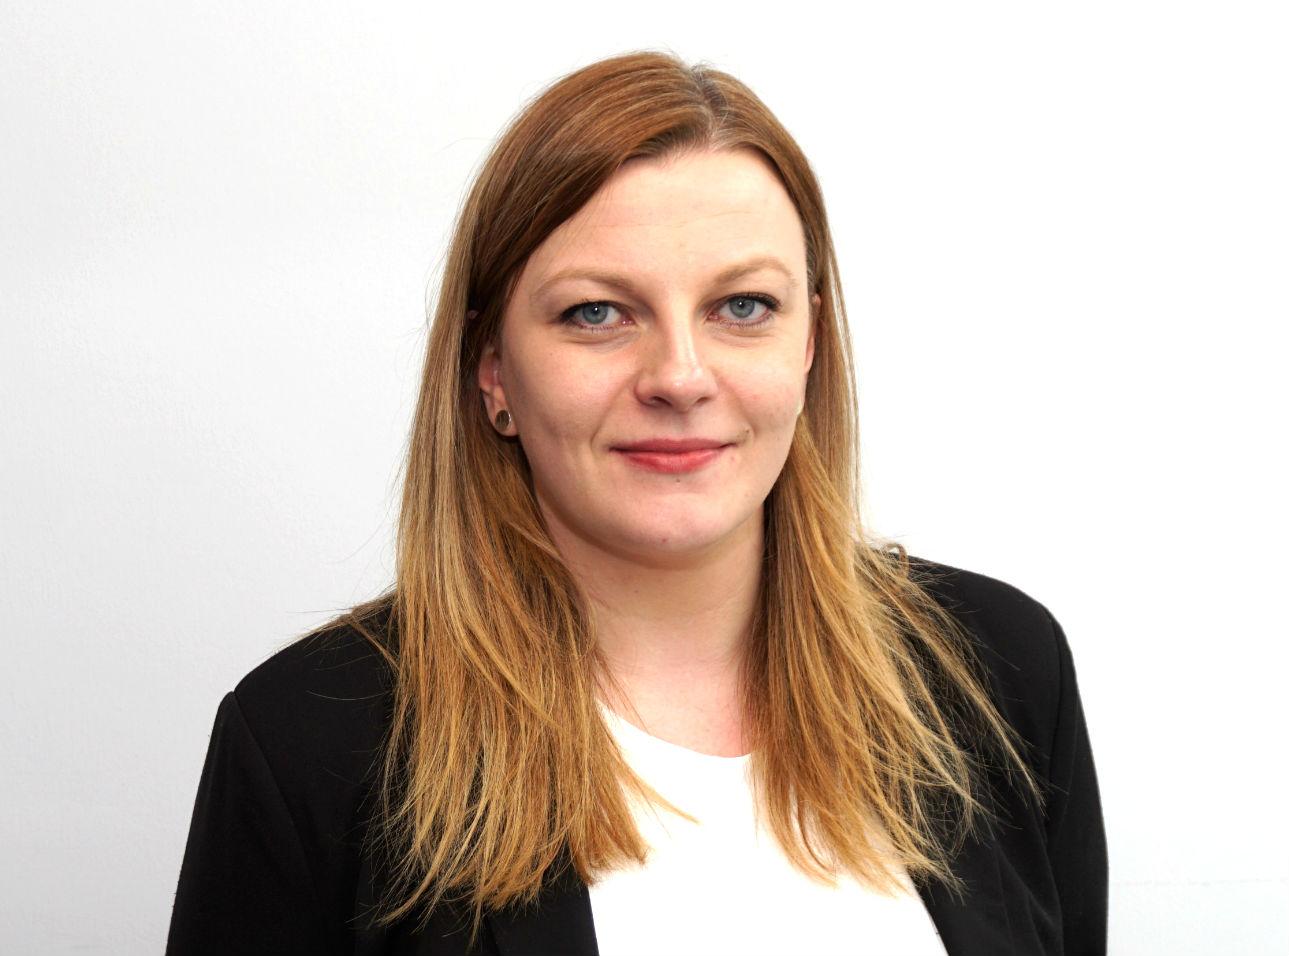 Eyðhild Holm Joensen : Creditor Accountant